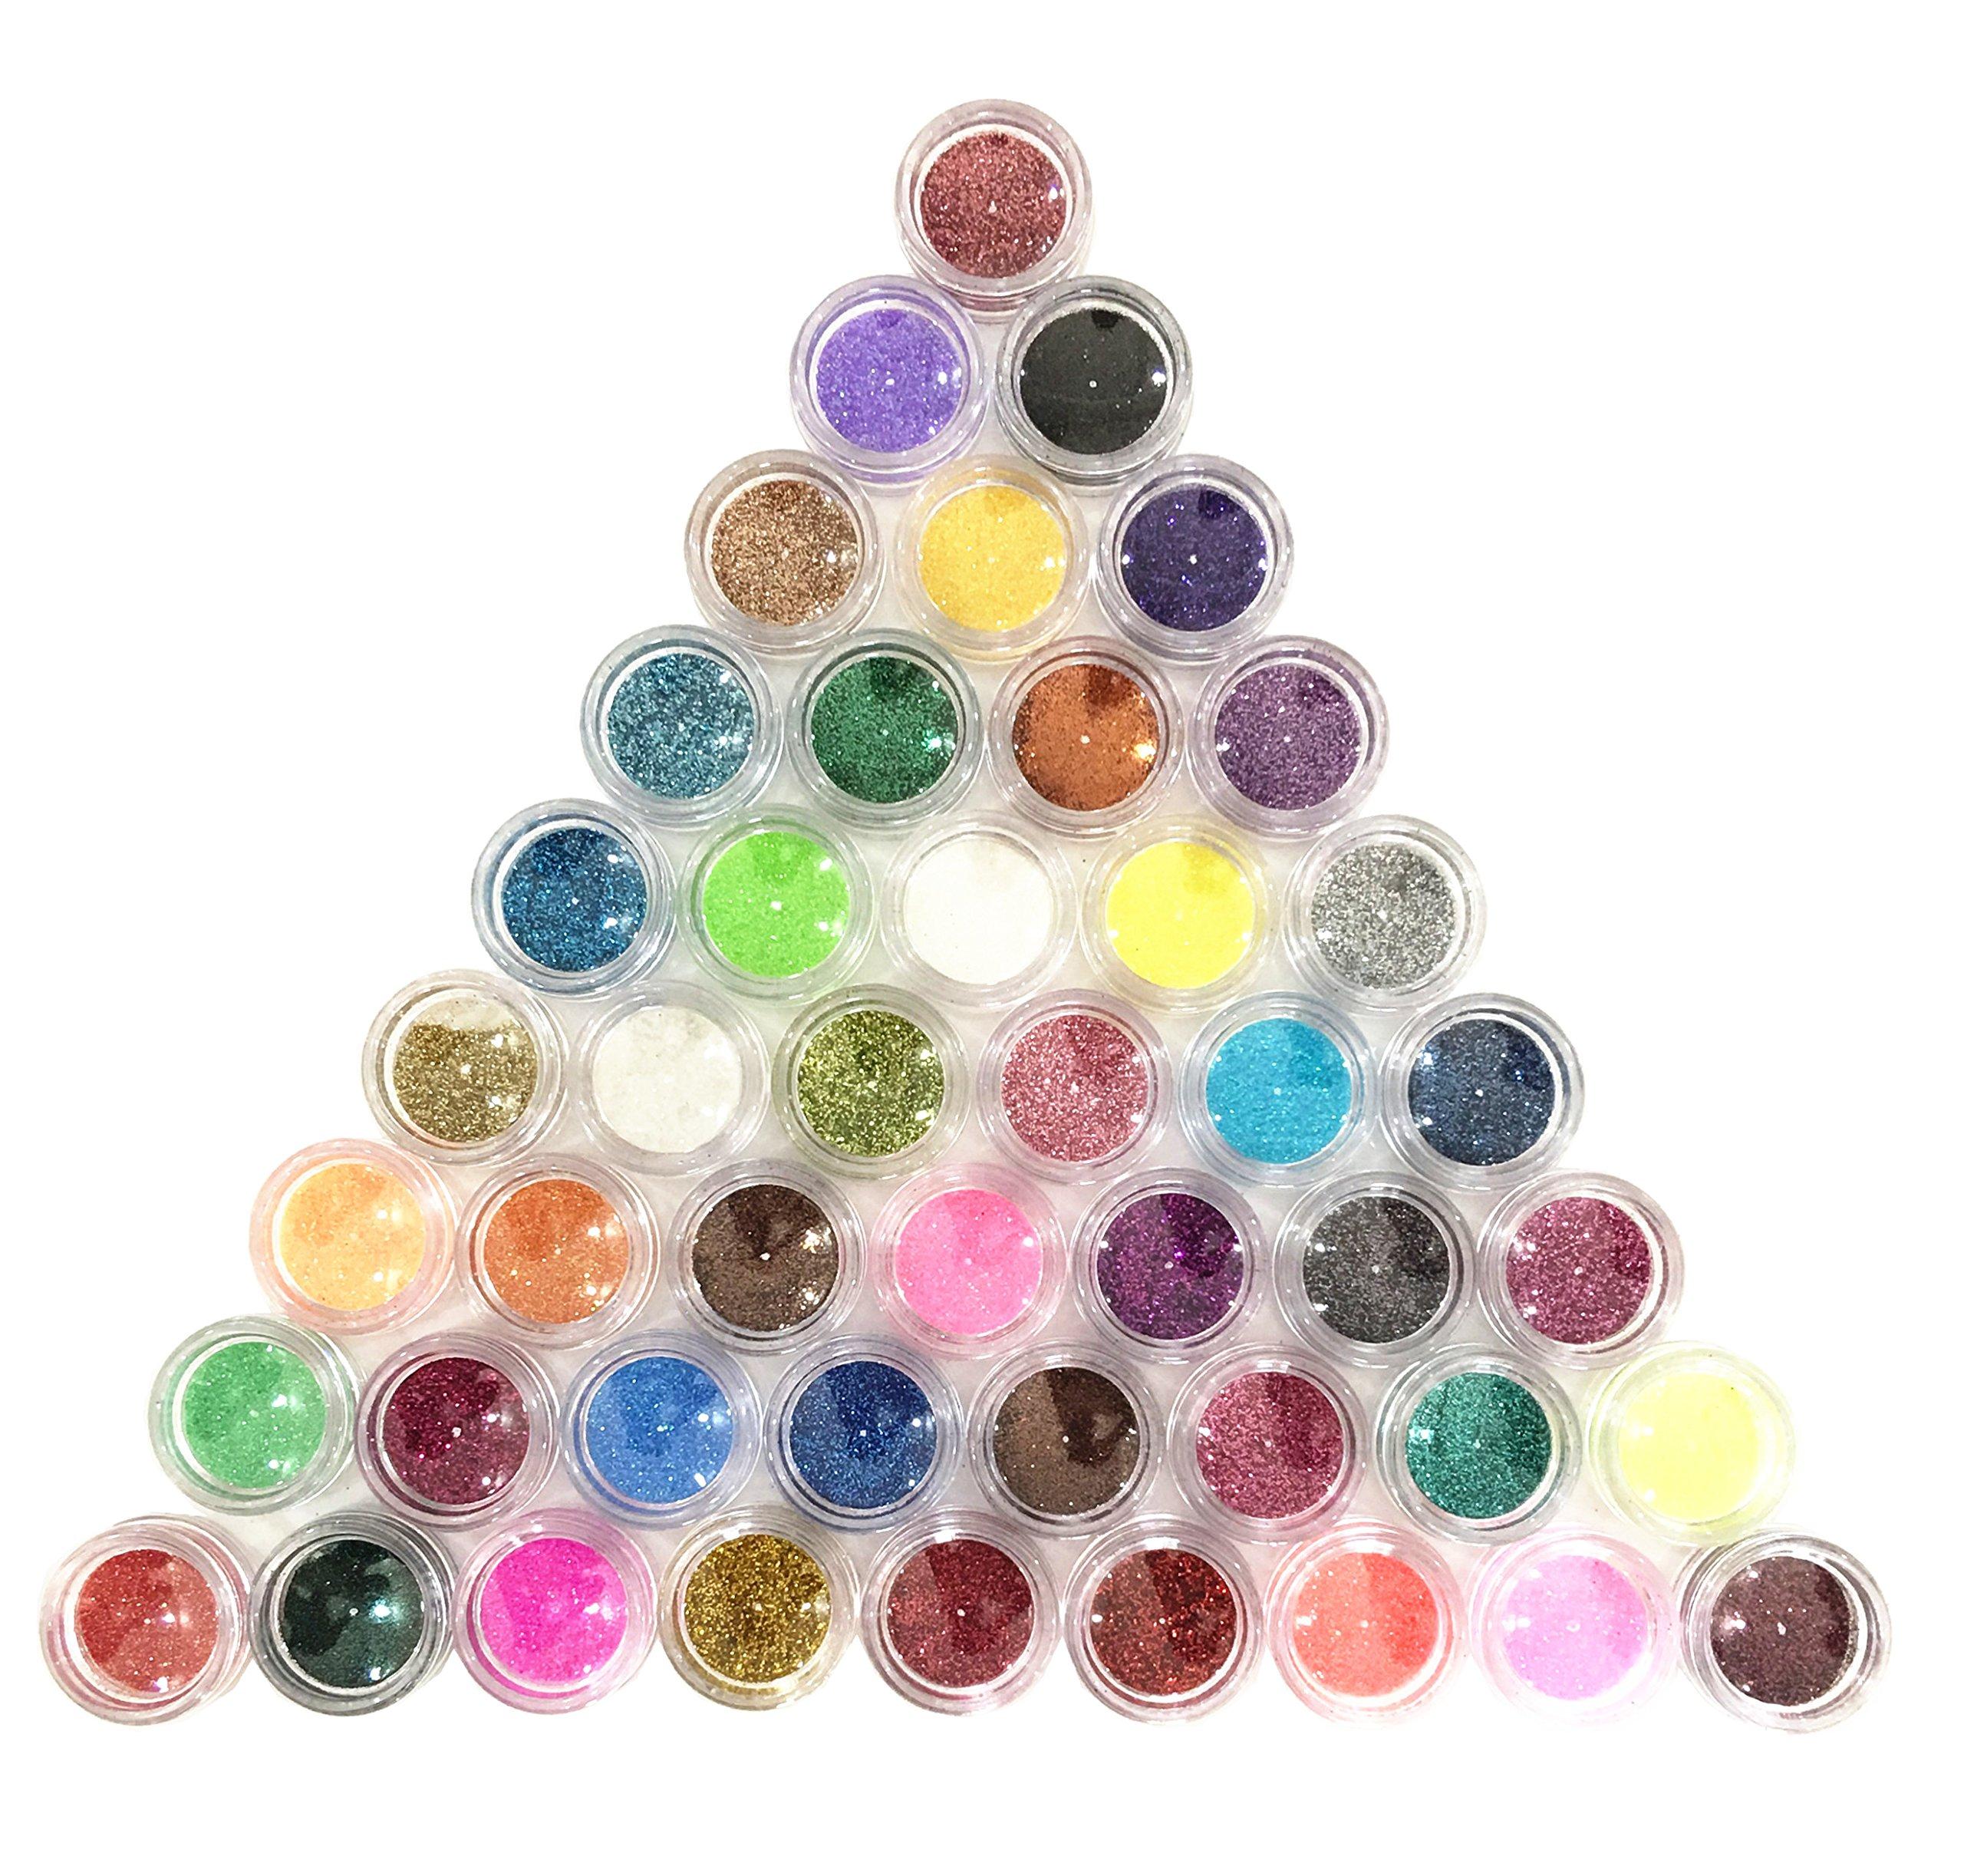 Buy Theons Nail Lacquer 45, nail art, vibrant colors, consistency ...